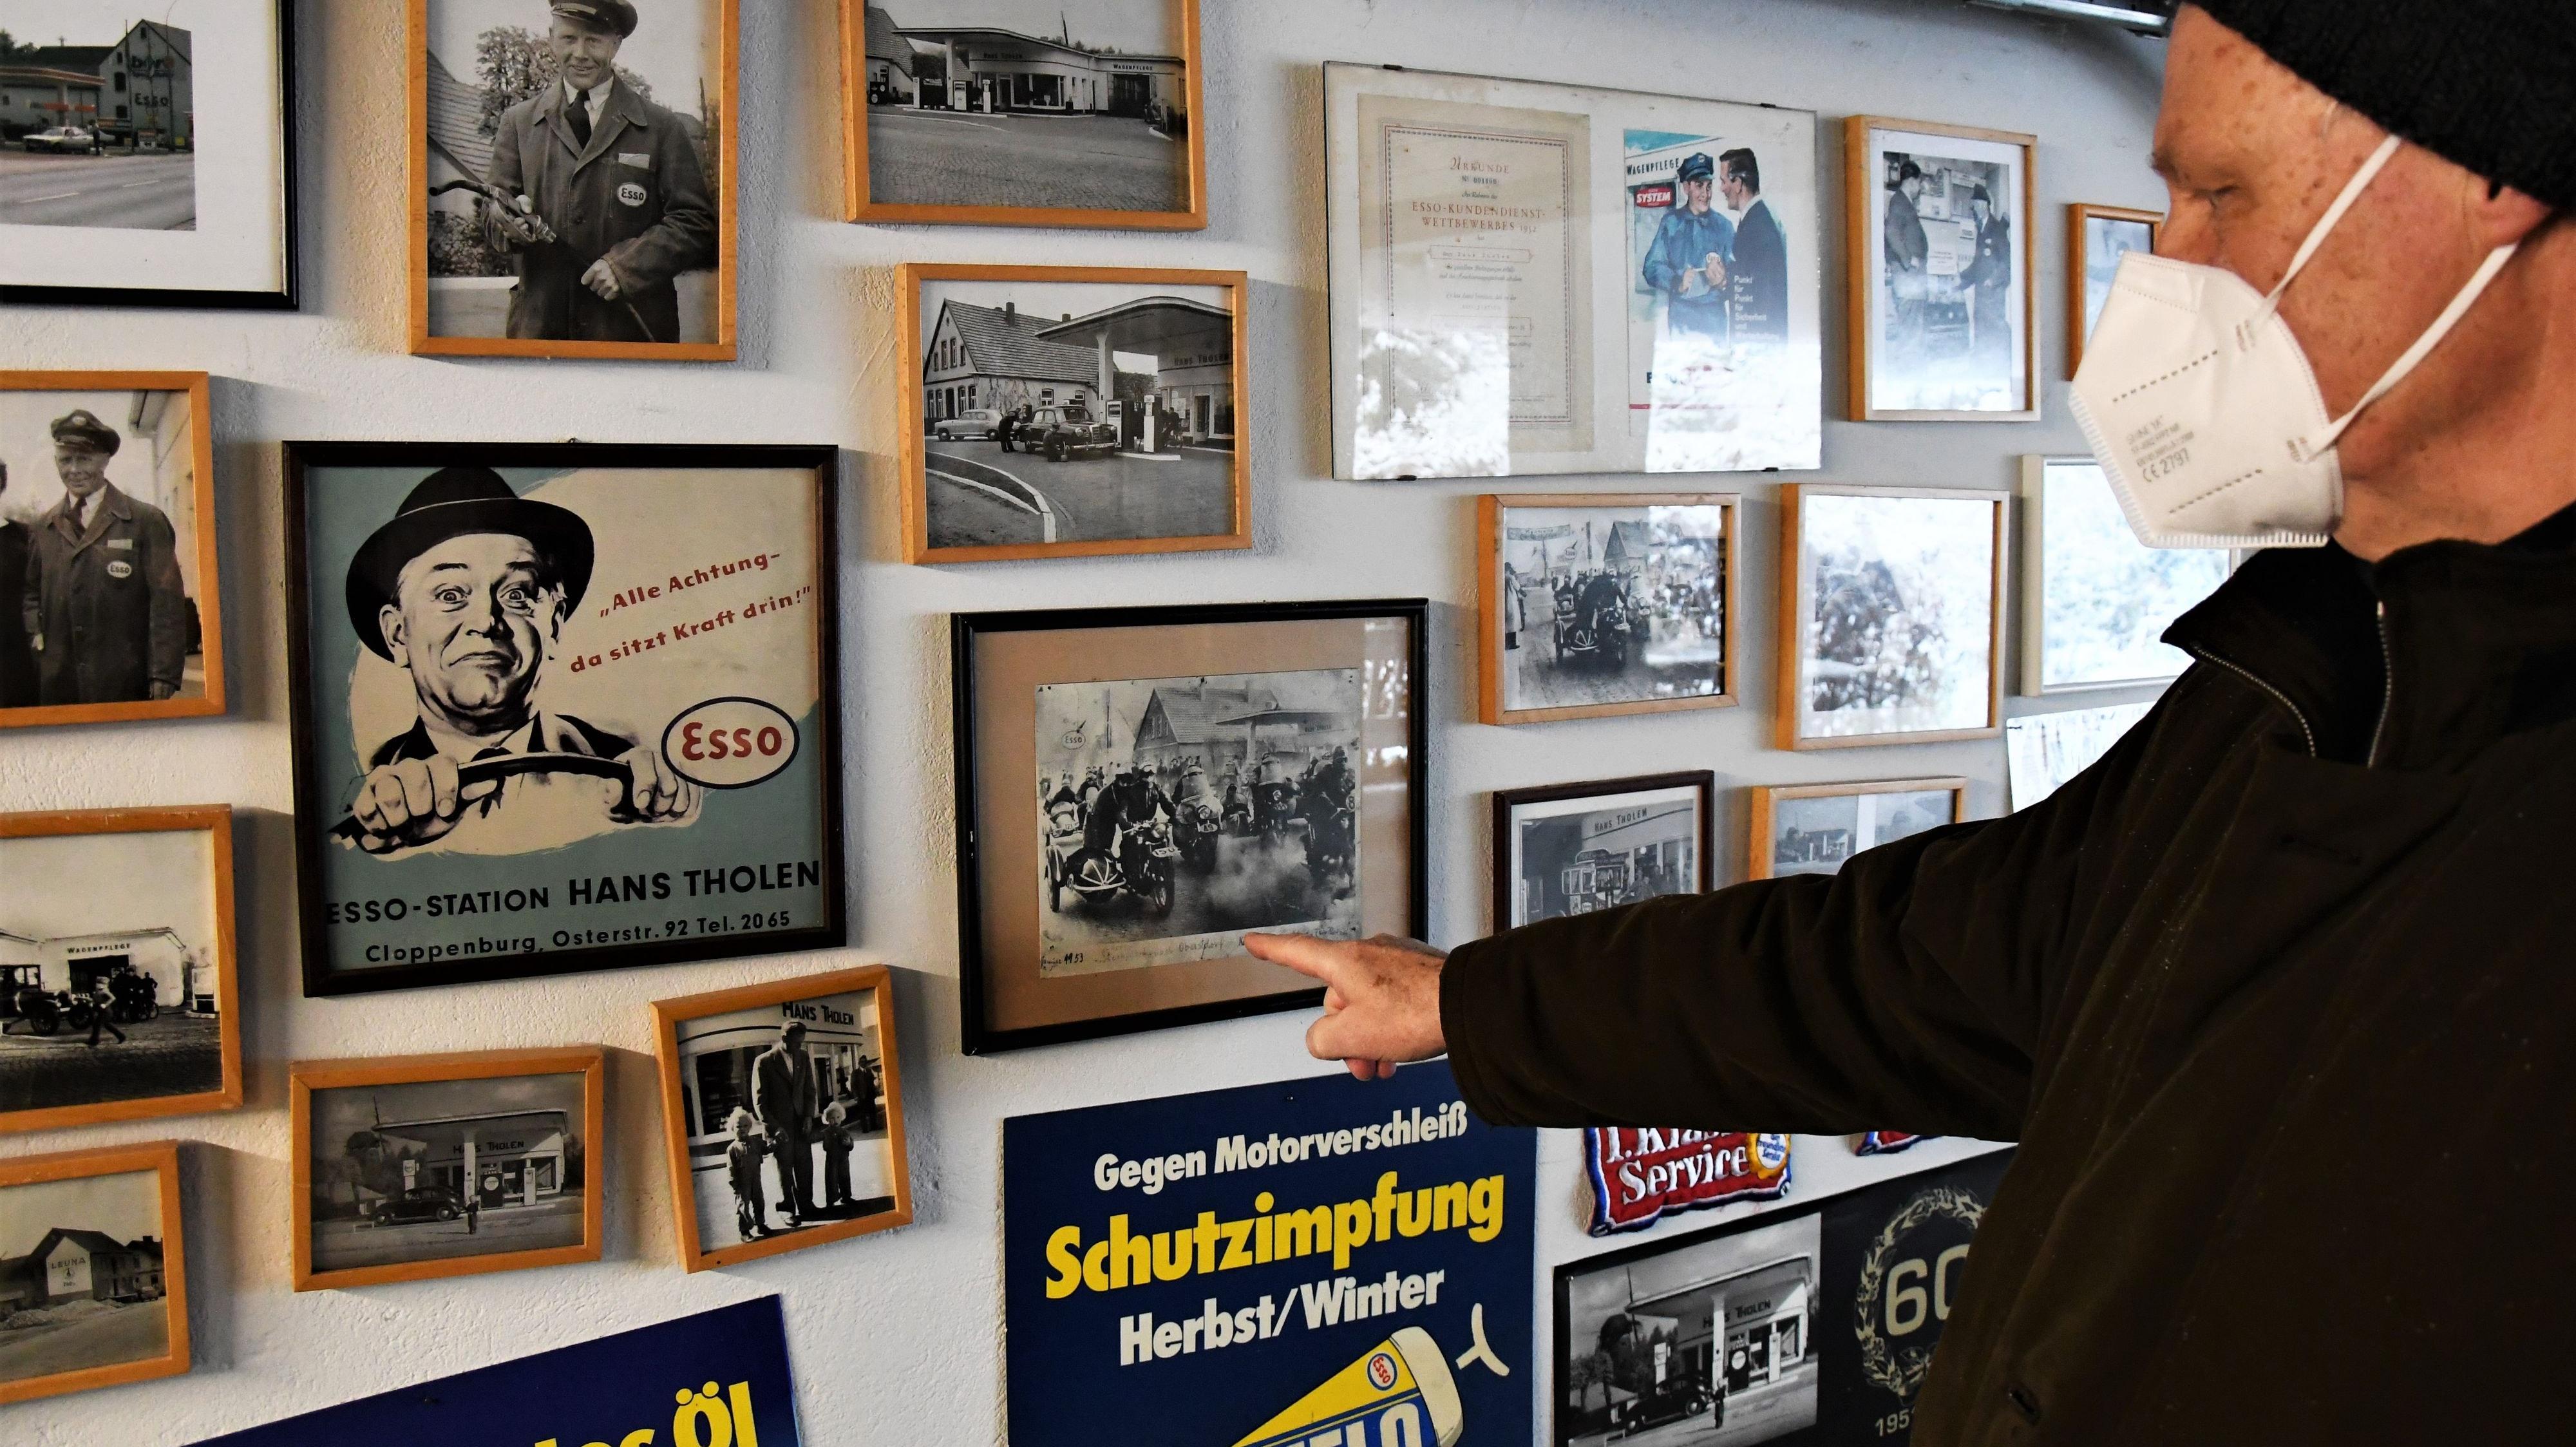 Wand voll Erinnerungen: Hans Tholen jun. hat zwei Garagen voll Erinnerungsstücke gesammelt. Foto: Kreke